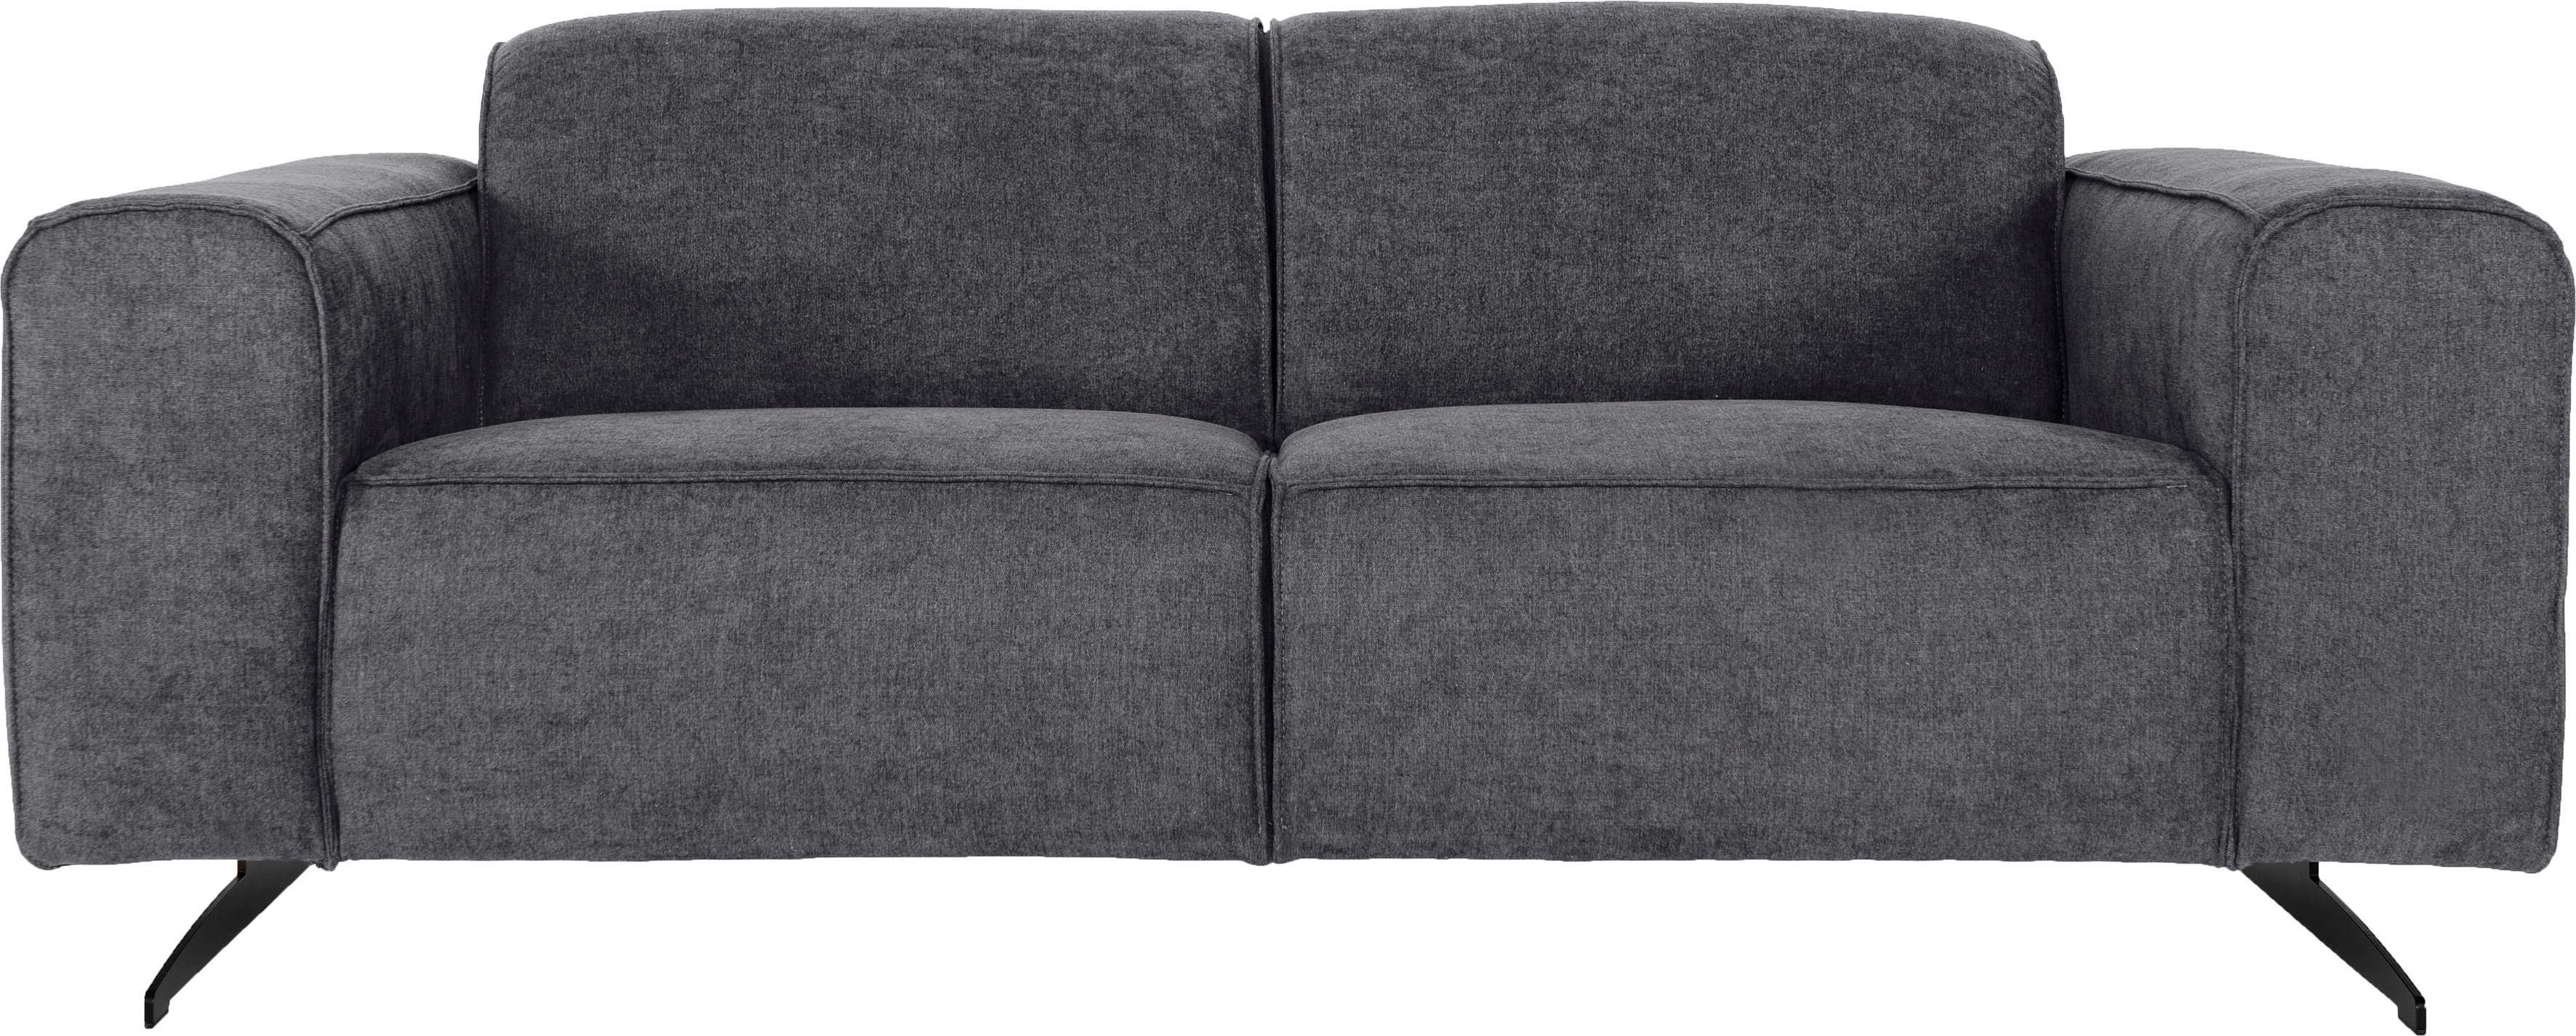 Design Sofa Cushion Covers Gebrauchtes Big Sofa Kaufen Sofa Cleaning Biggleswade Moderne Wohnzimmer Couch Fabric C Murcia Big Sofa Kaufen Holzwerkstoff